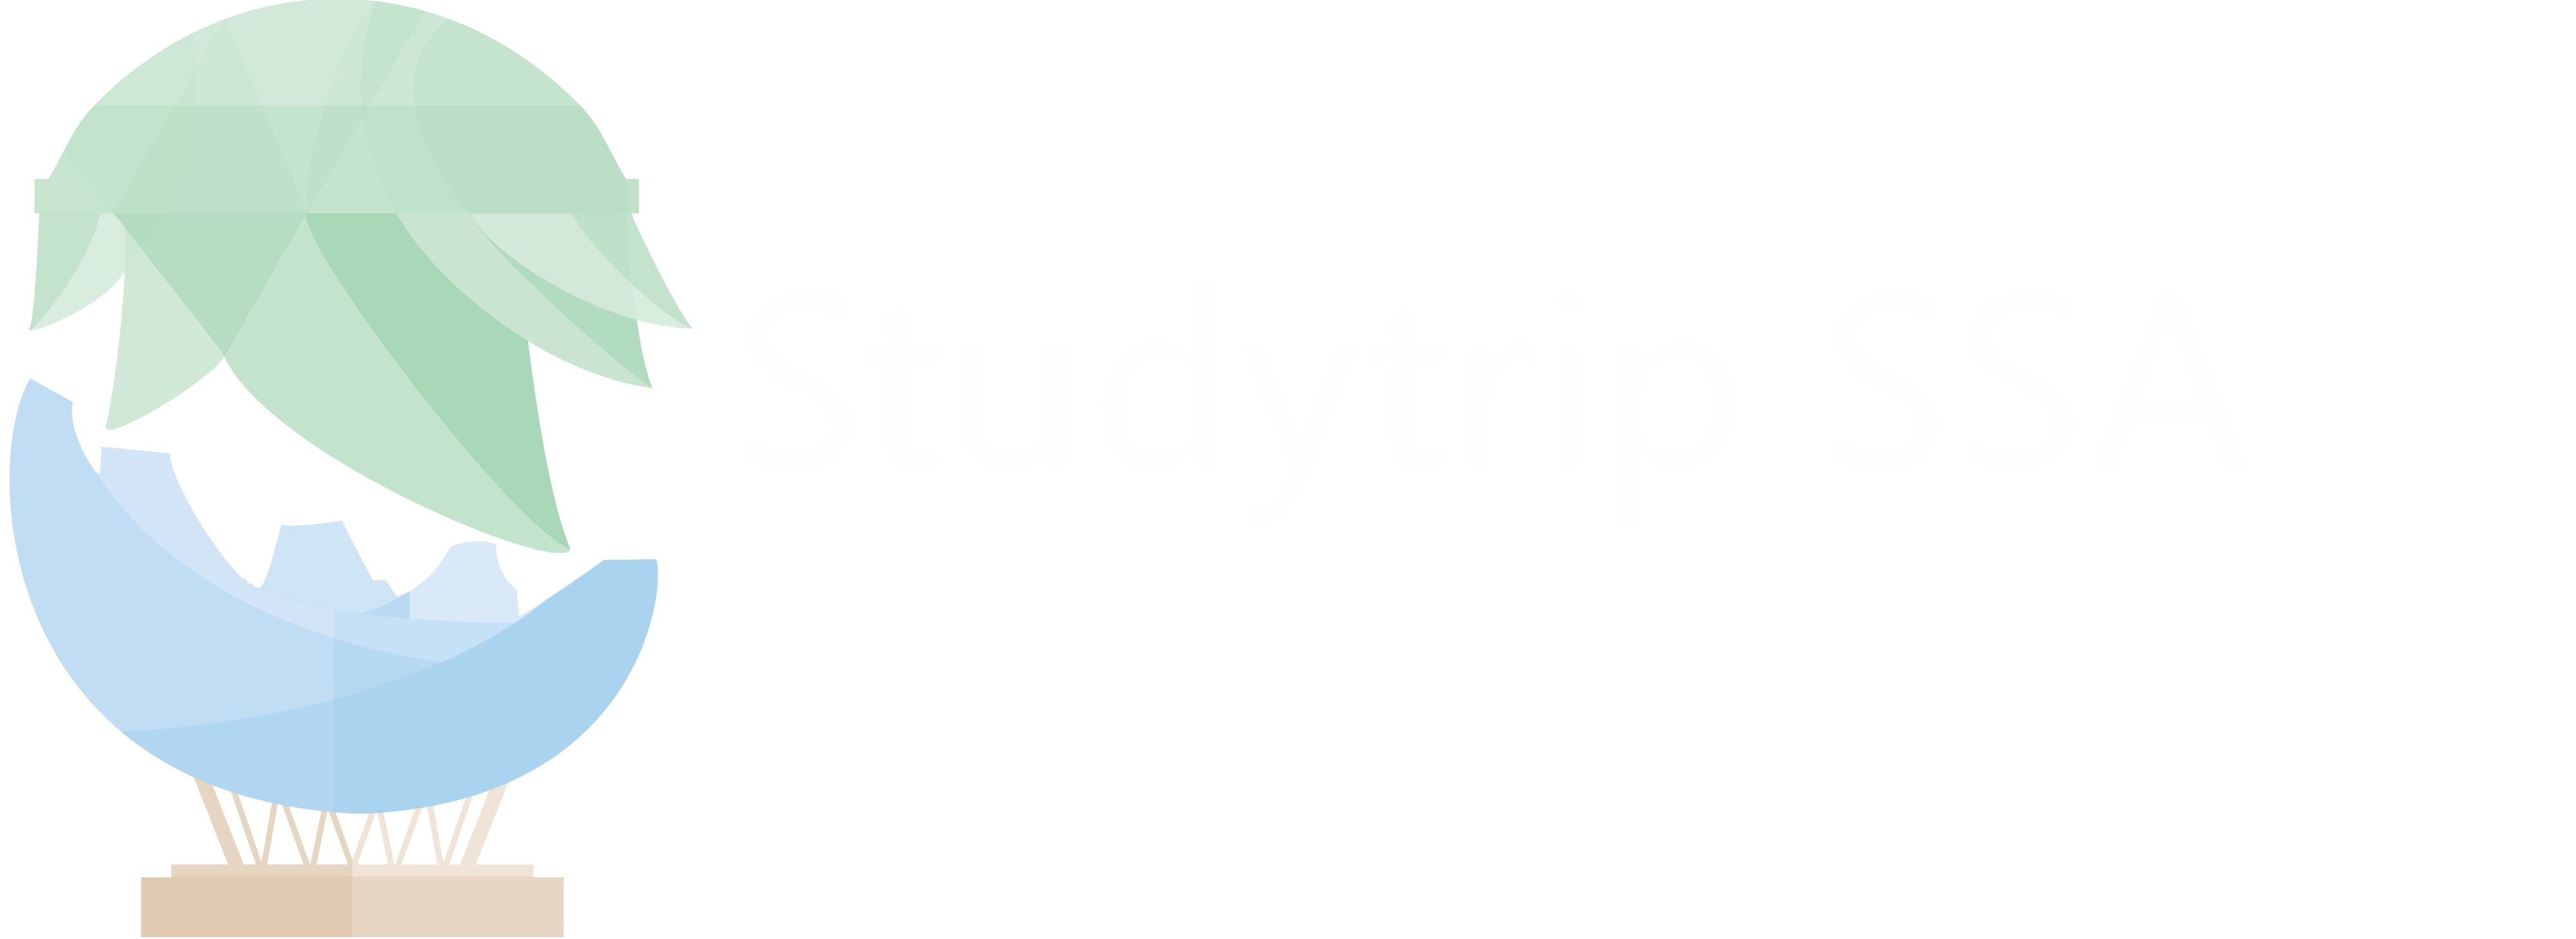 Studytrip SSA